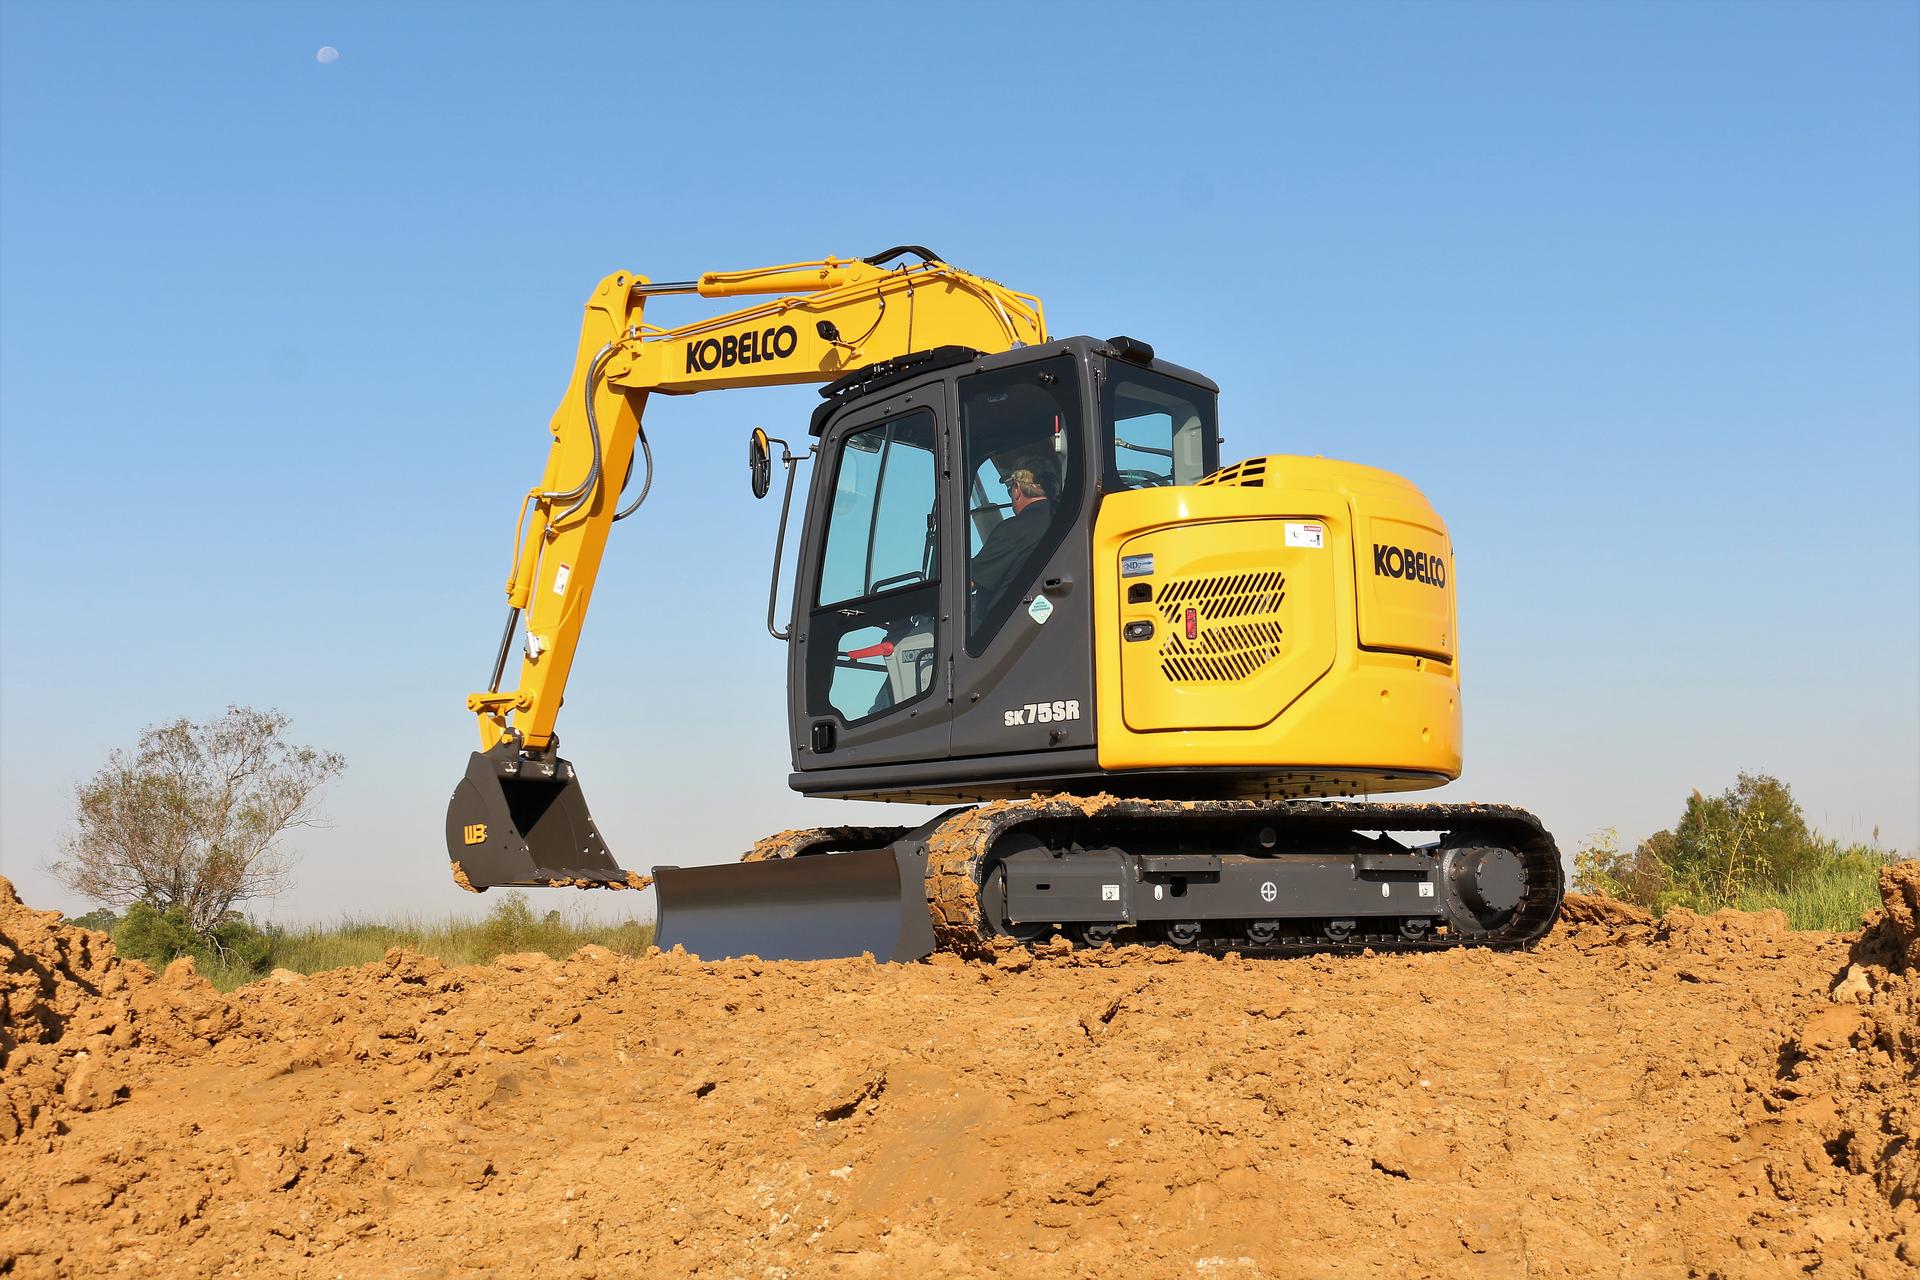 Kobelco SK75R-7 compact excavator with bucket